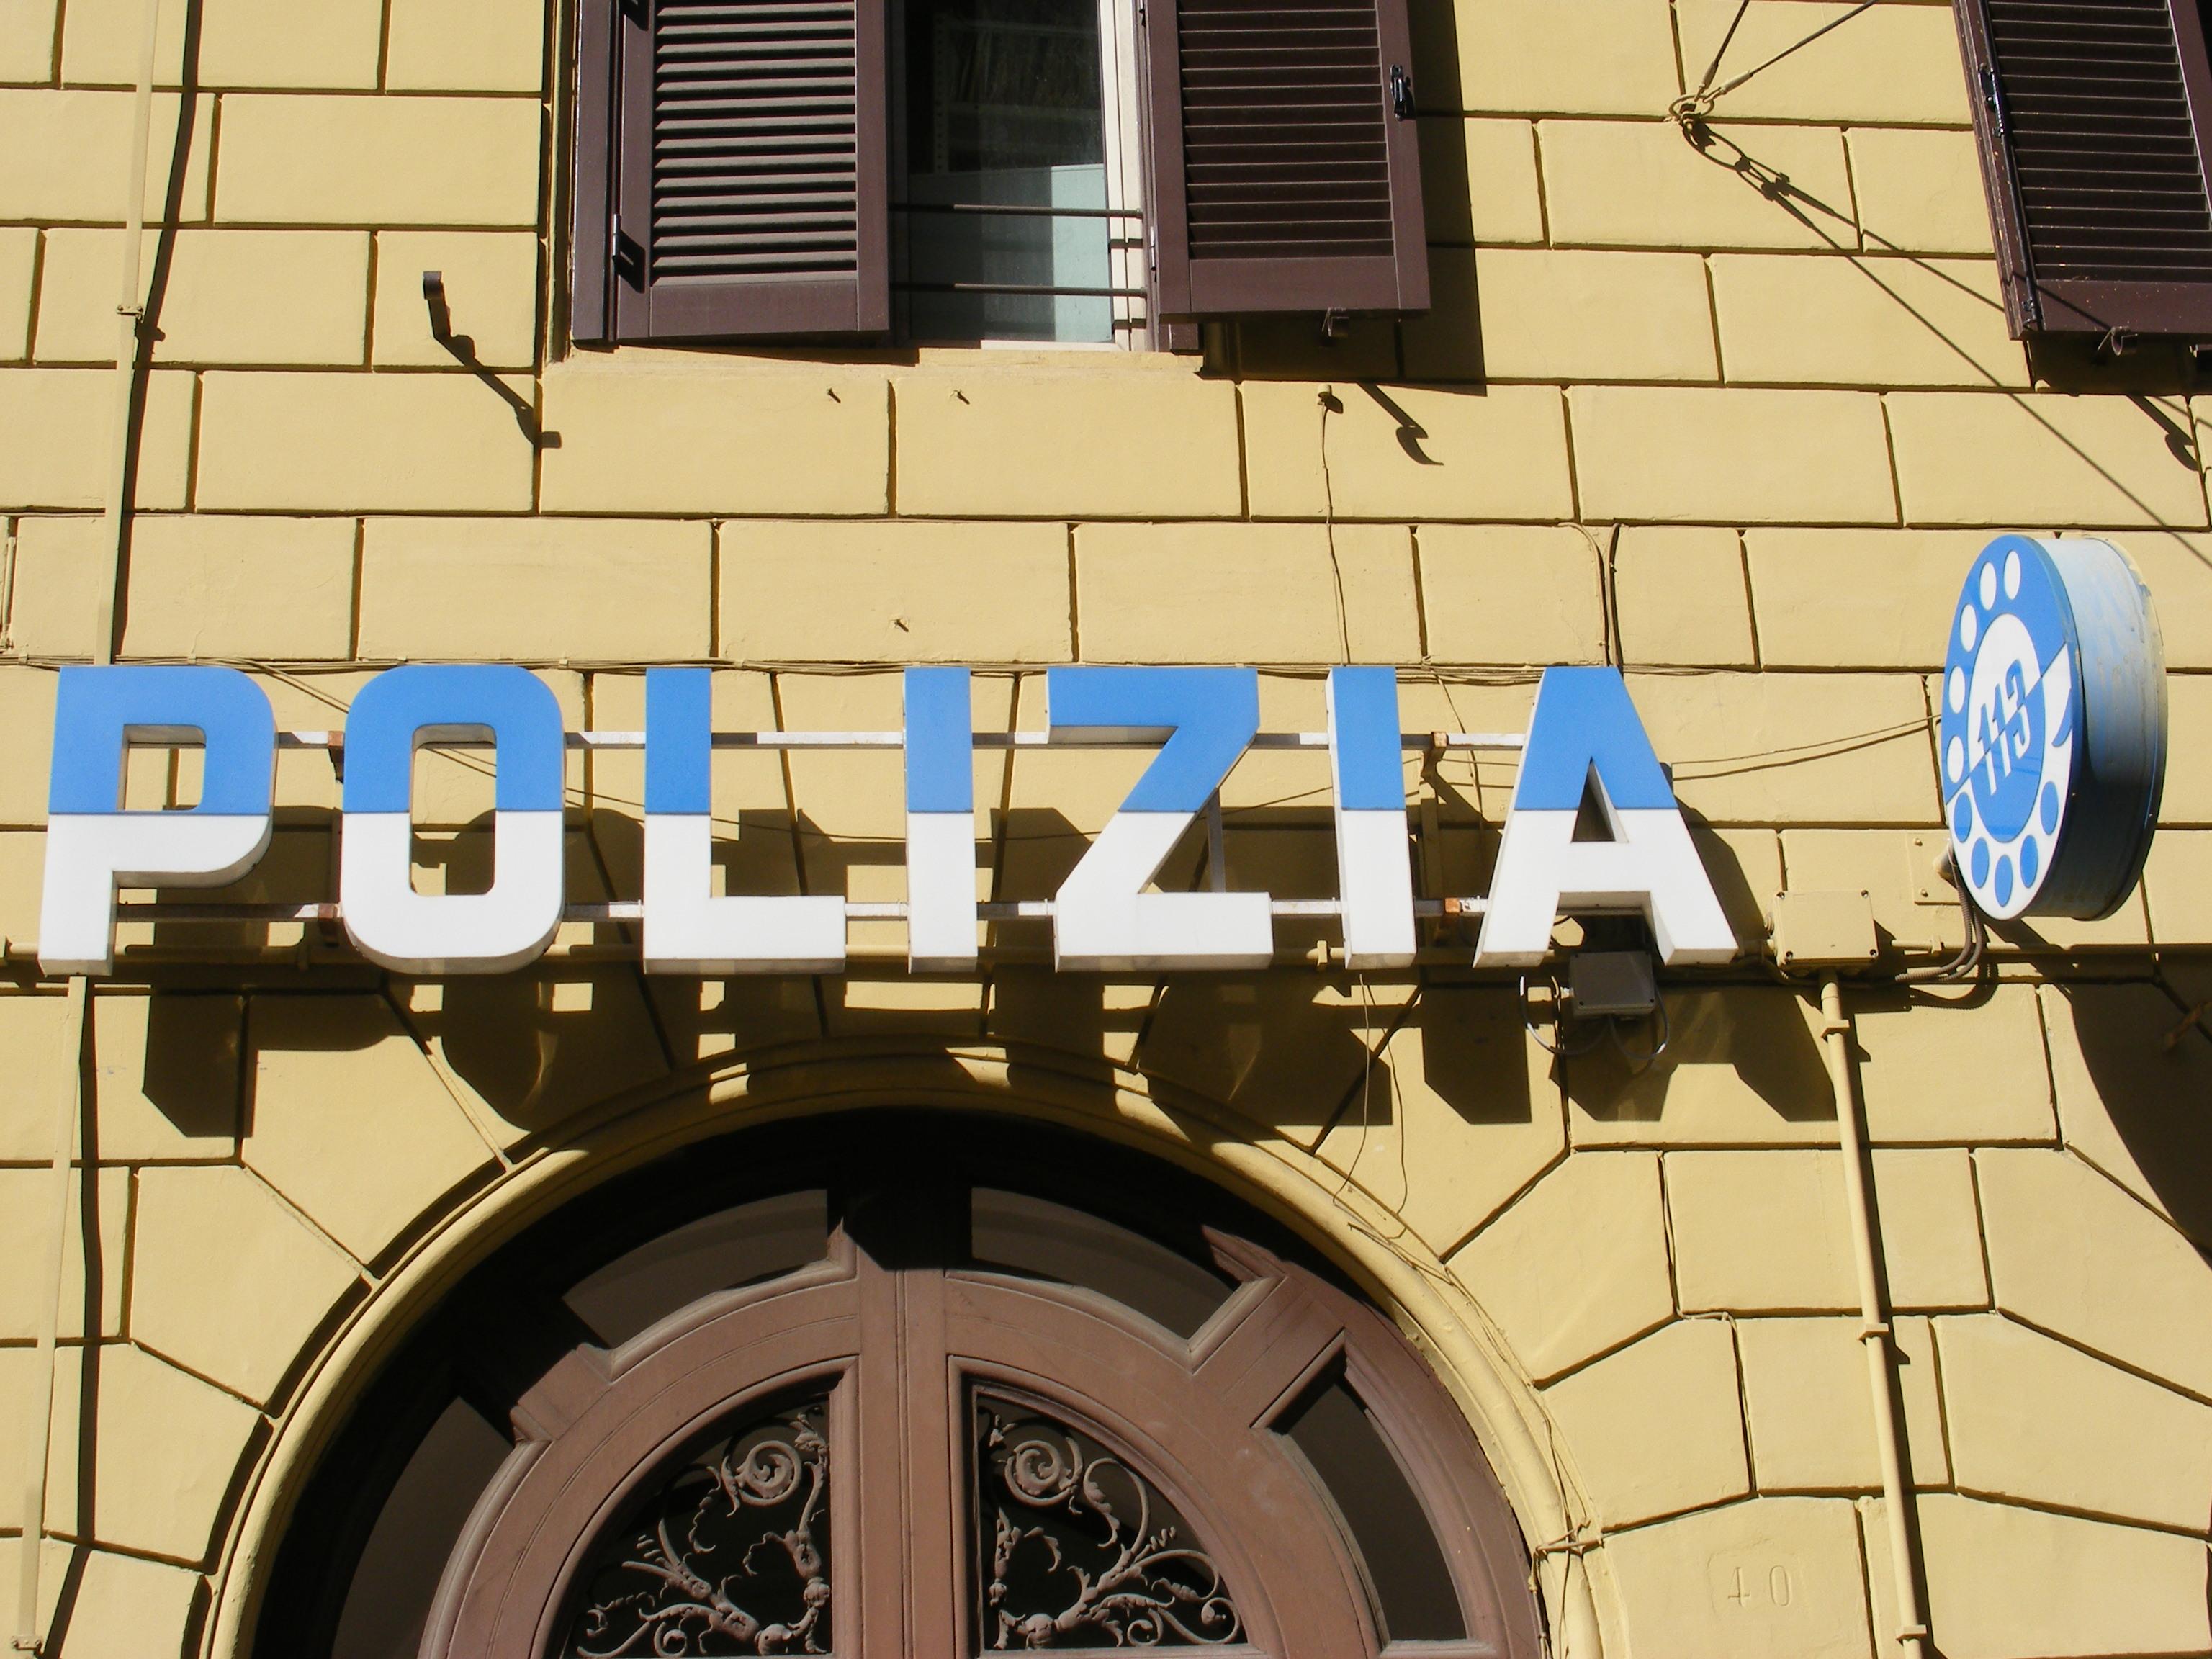 FilePolice station in Rome Italyjpg  Wikimedia Commons